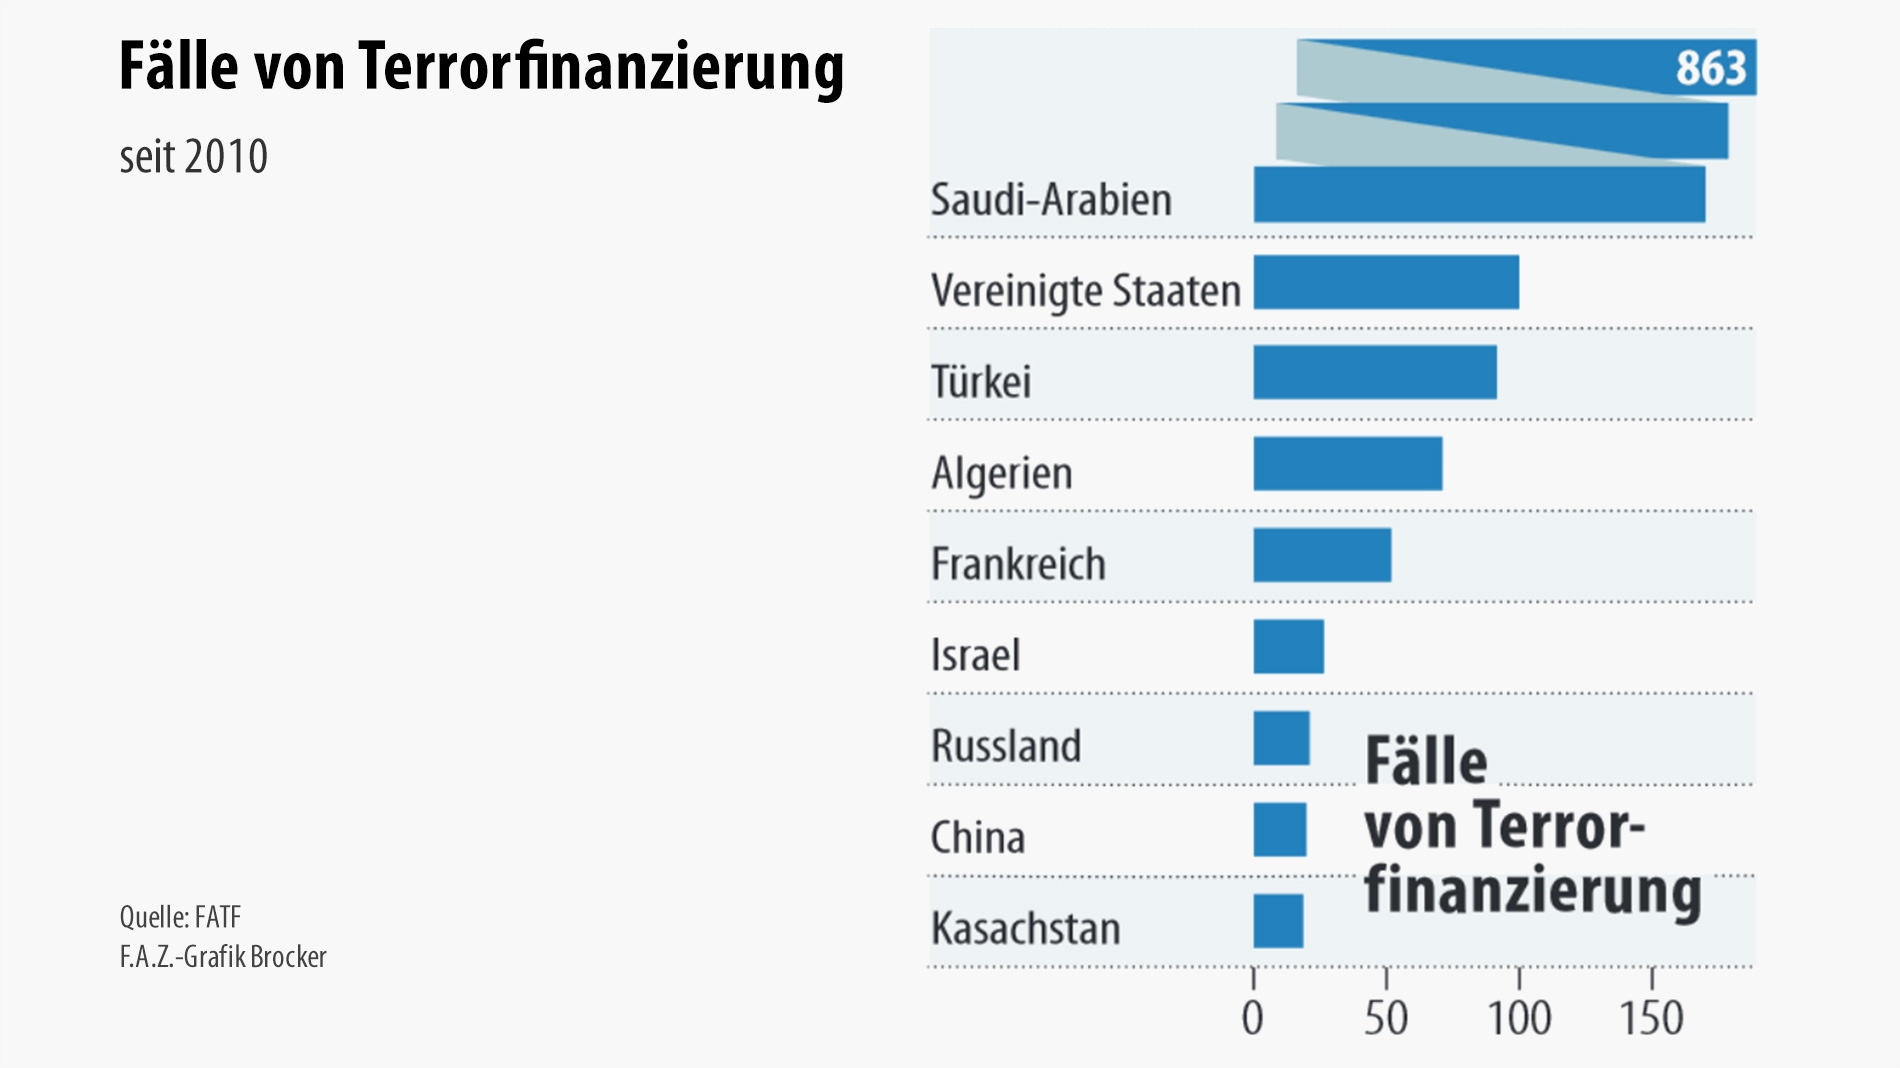 0044-01 Terrorfinanzierung global laut FAZ